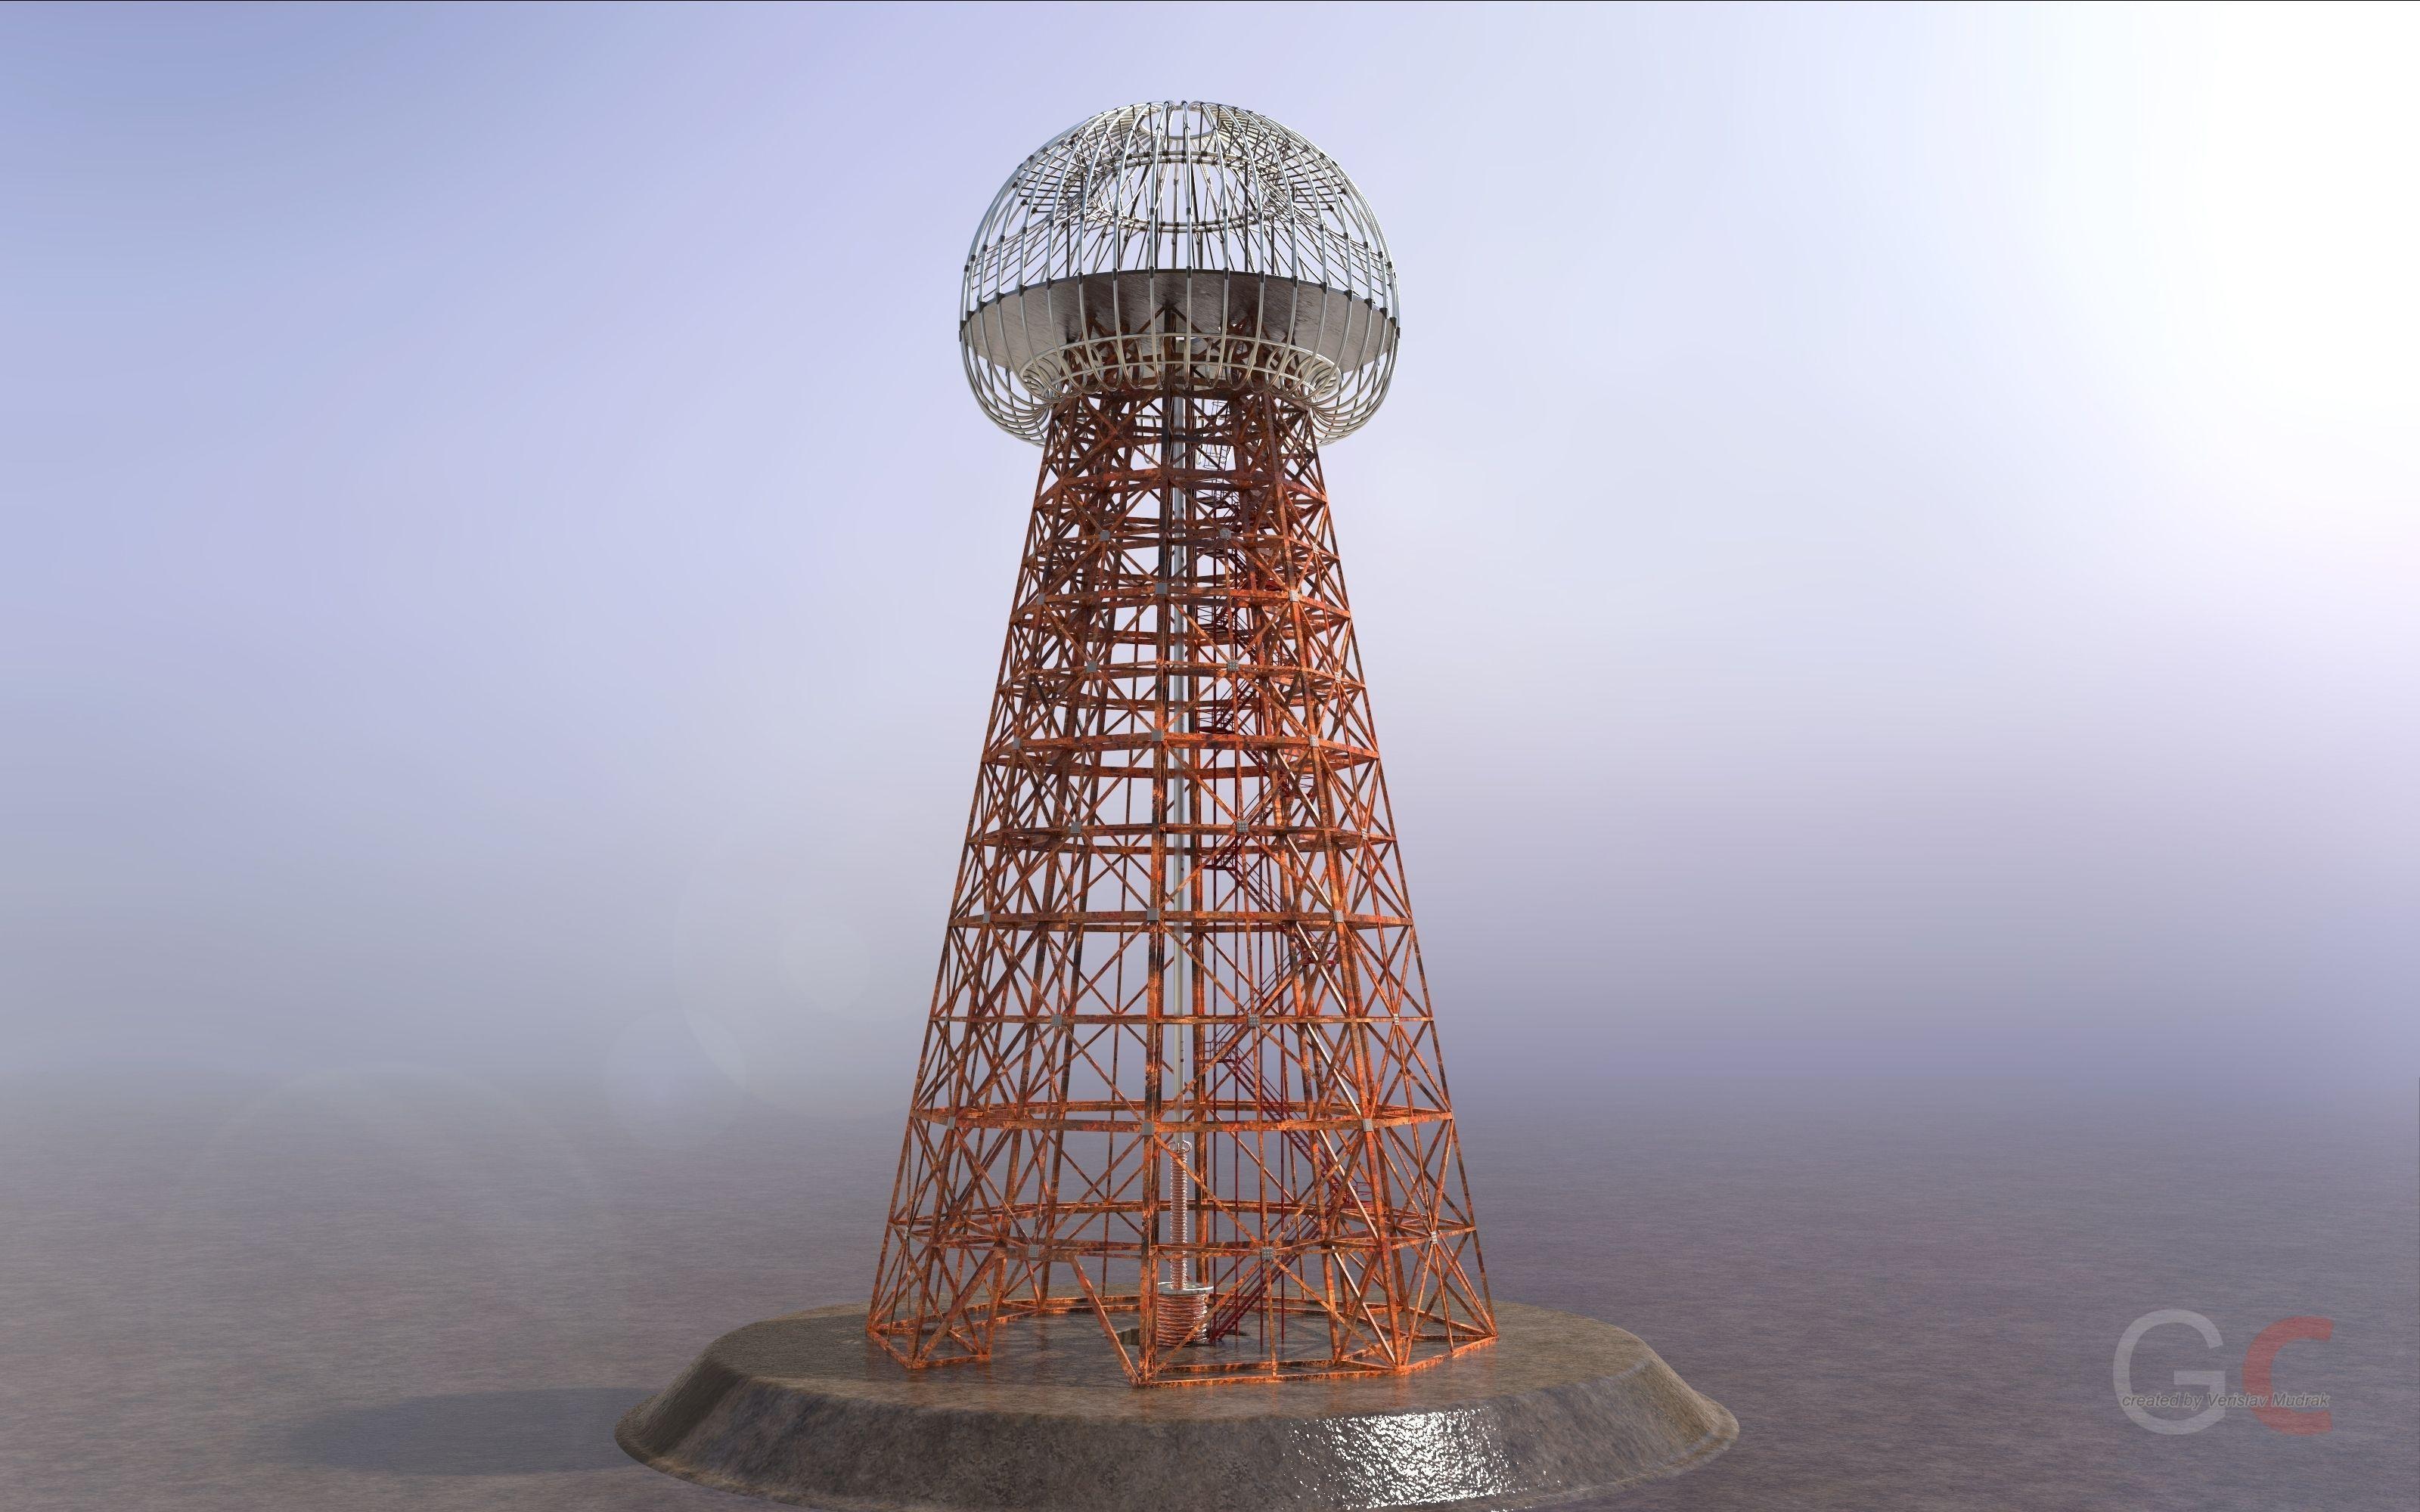 Tesla Tower Free 3d Model Stl Sldprt Sldasm Slddrw